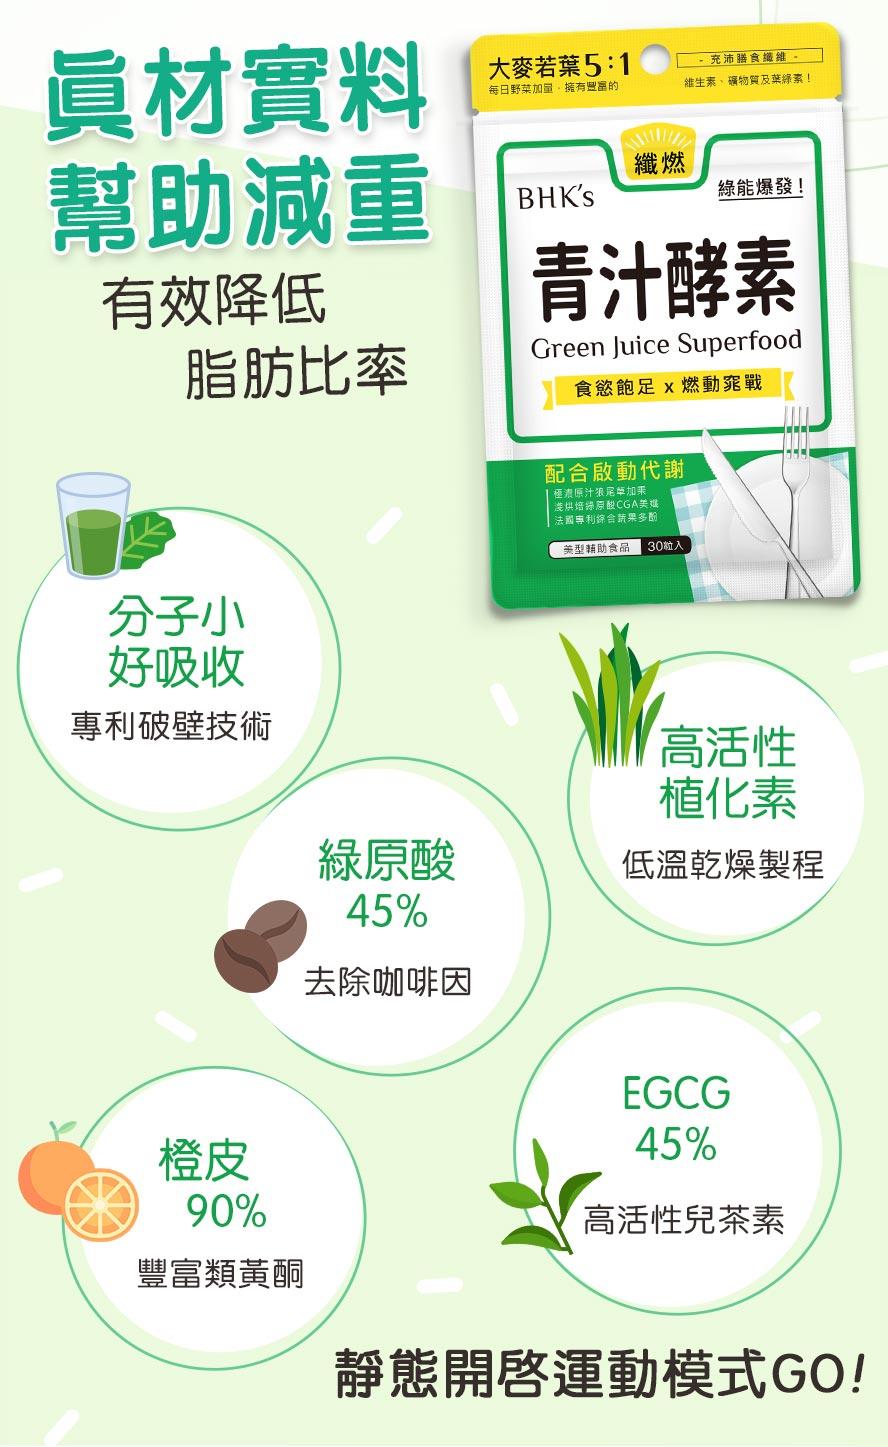 BHKs青汁酵素使用專利破壁技術,分子小好吸收;兒茶素含量45%,綠原酸含量45%.